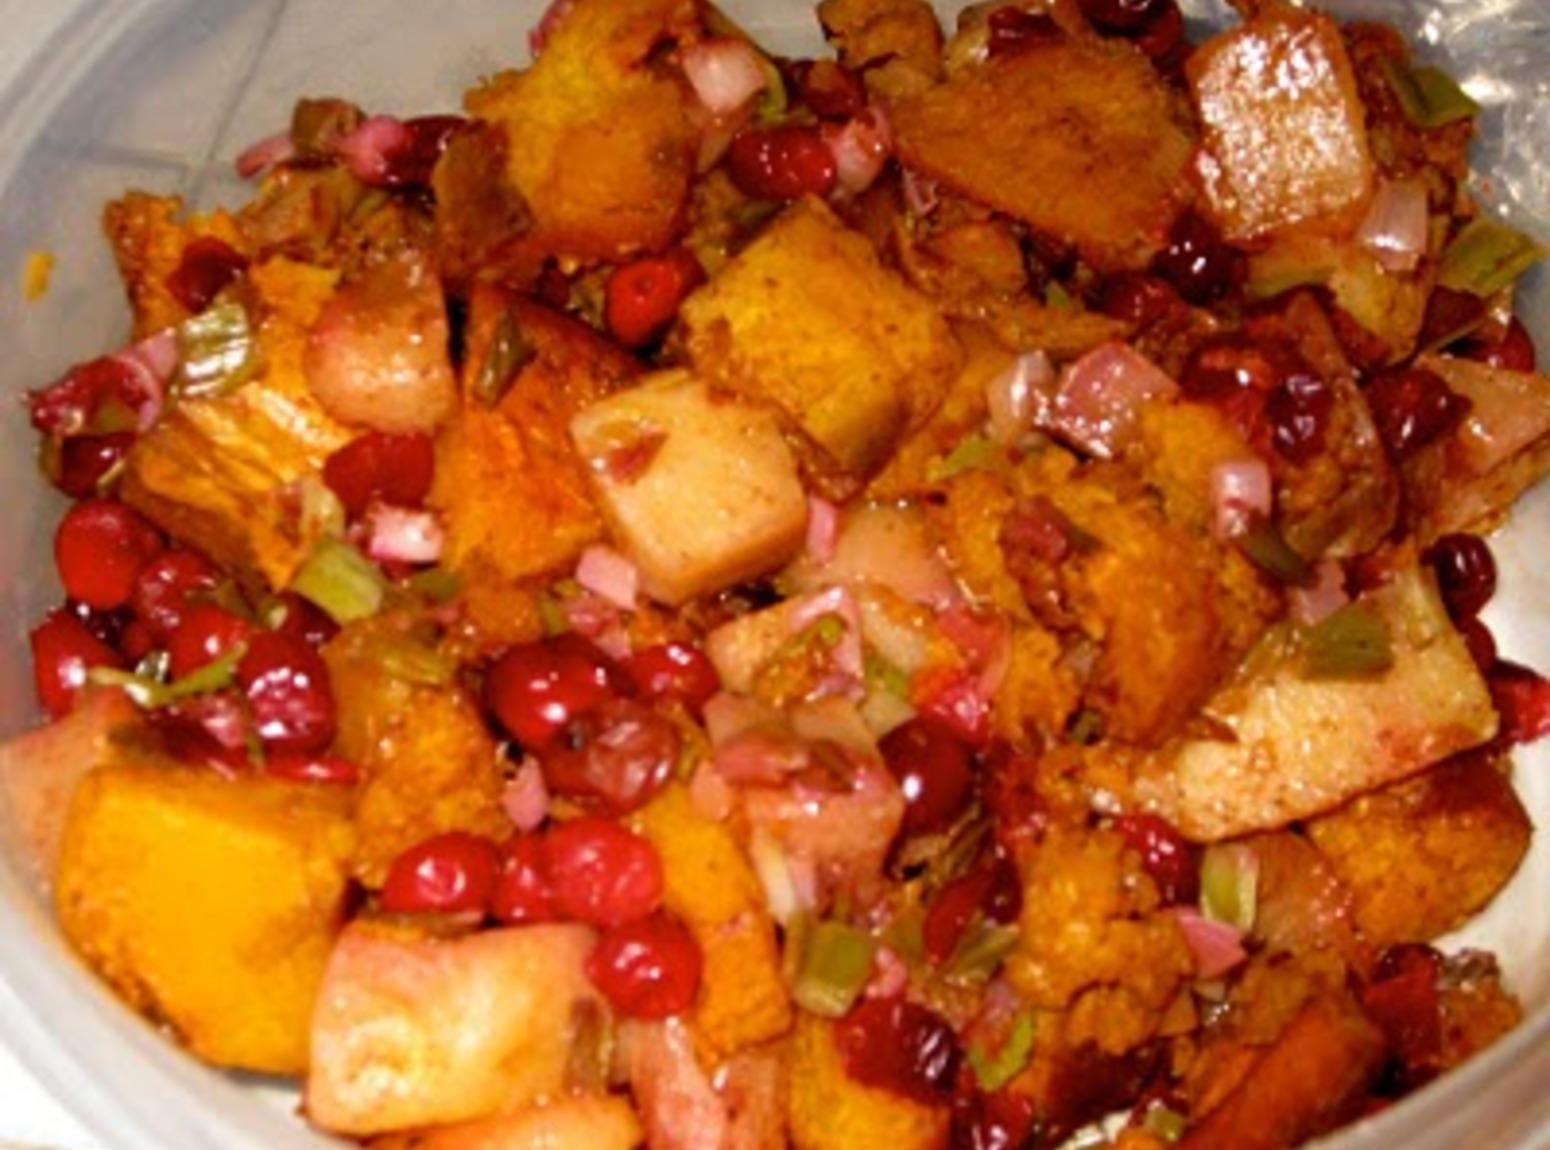 Candied Sweet Potato Side Dish Recipe